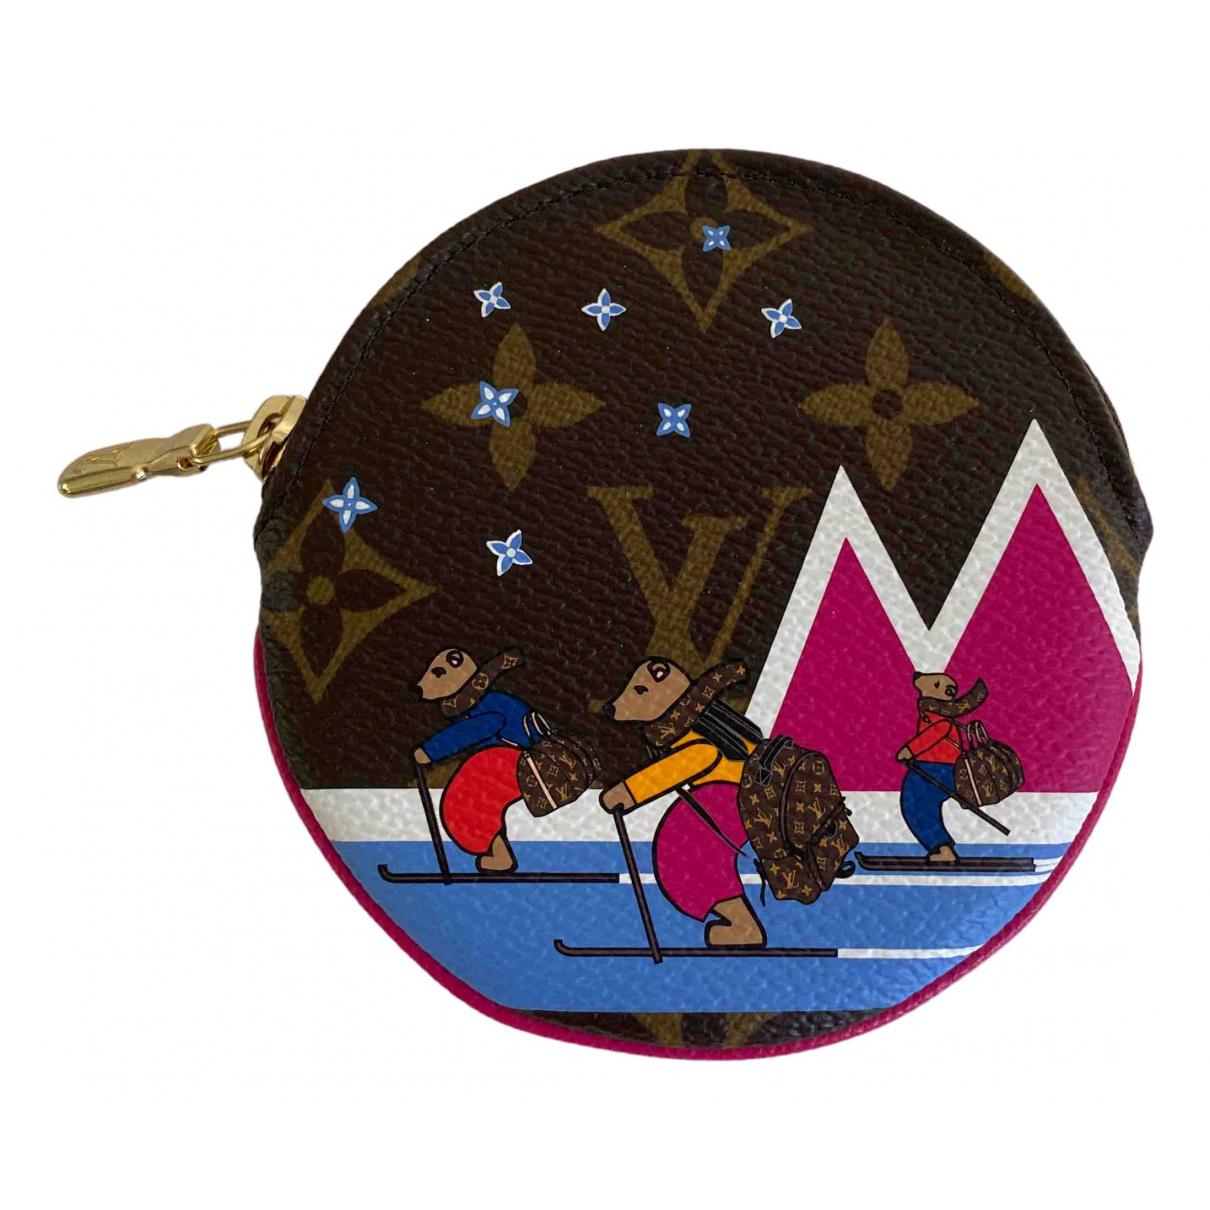 Louis Vuitton N Brown Cloth Purses, wallet & cases for Women N